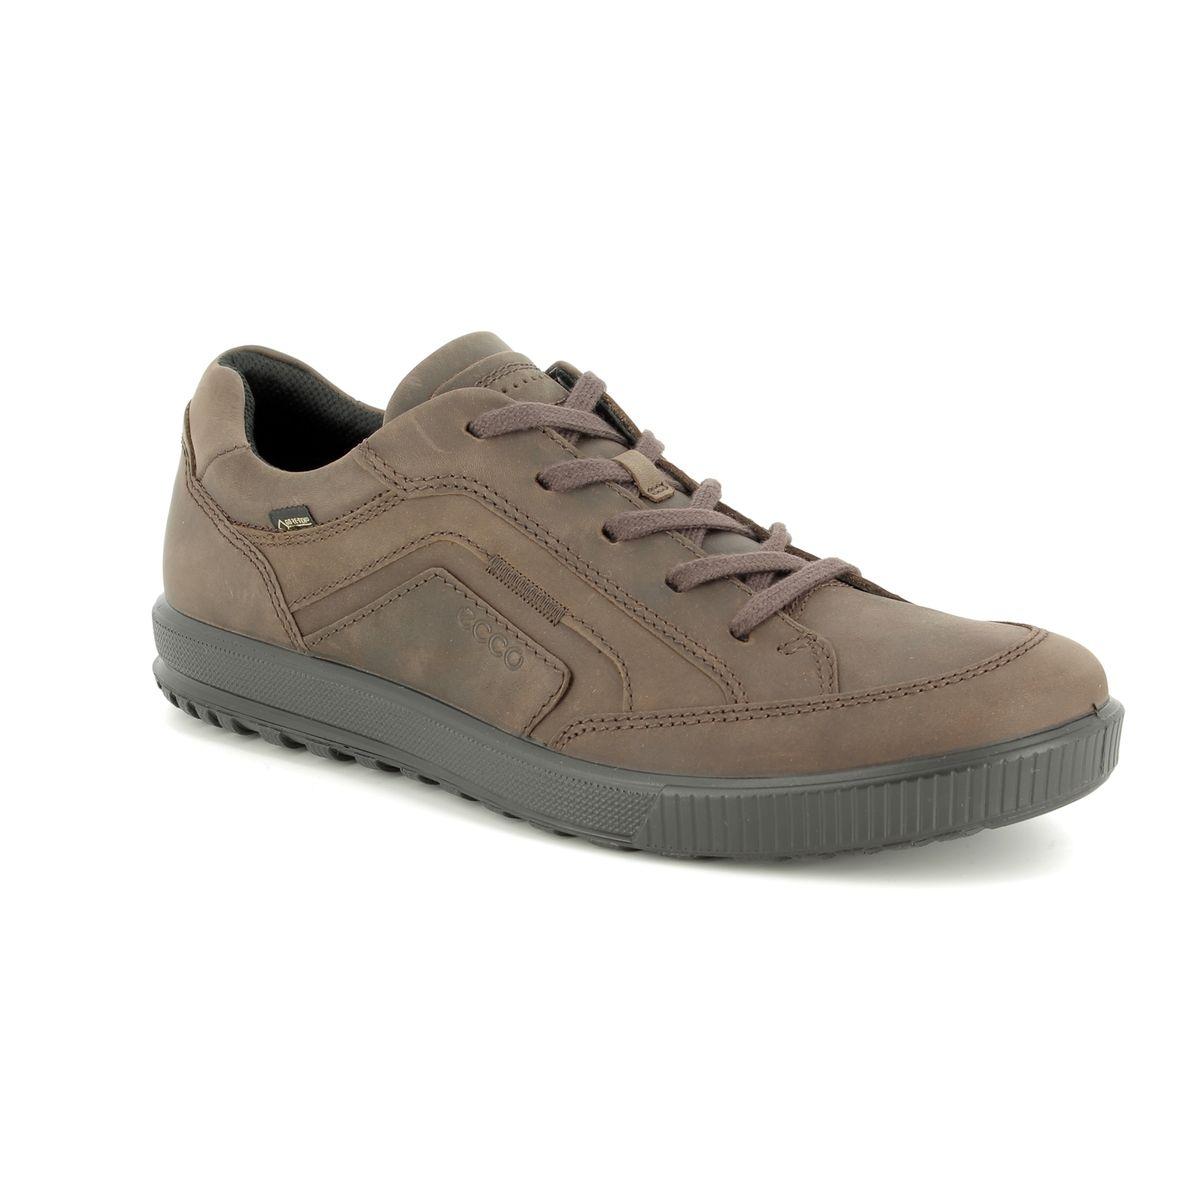 153ae684338f ECCO Casual Shoes - Brown nubuck - 534294 02072 ENNIO GORE-TEX